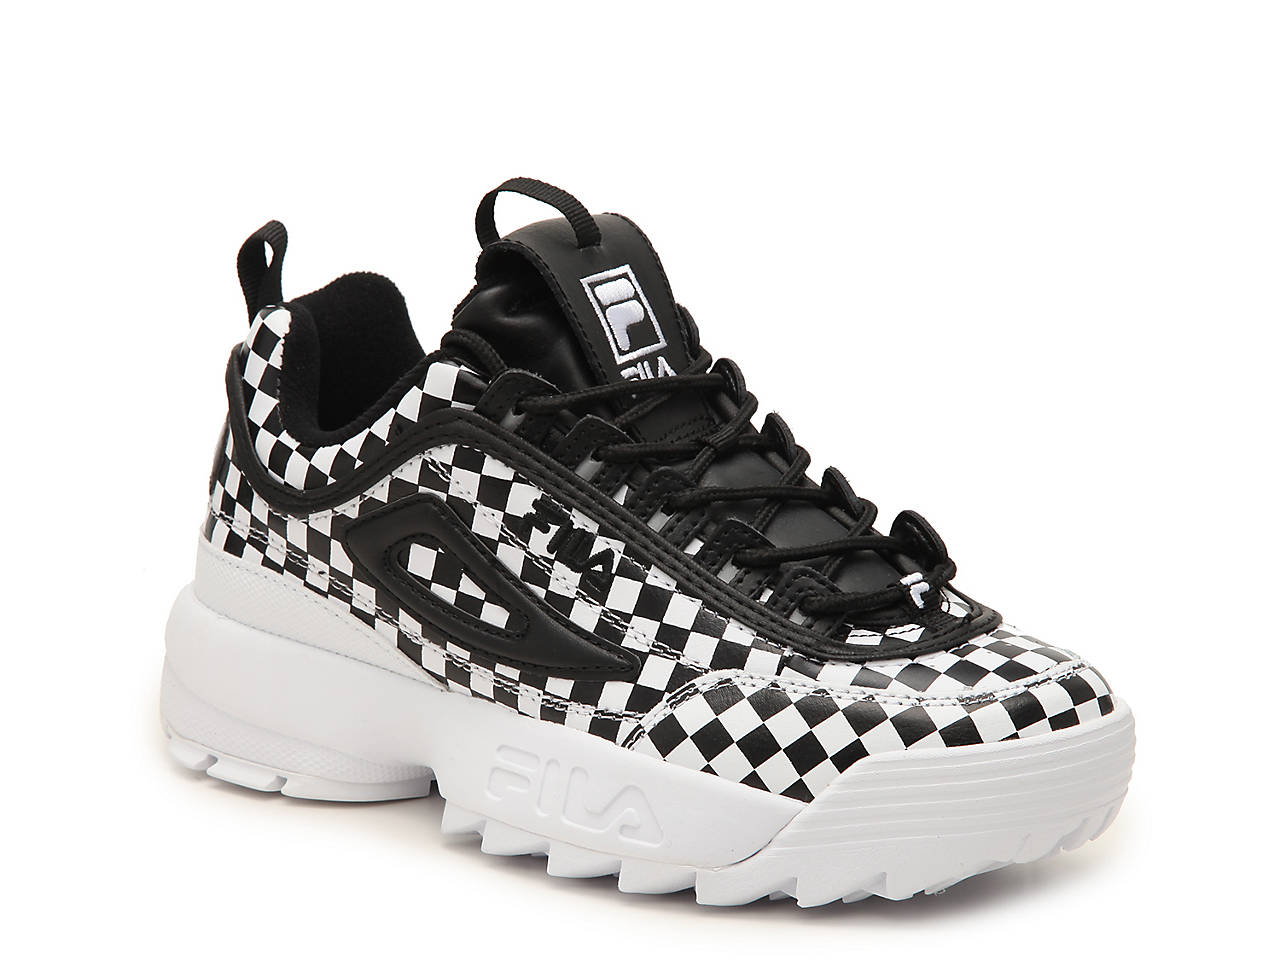 Fila Disruptor II Checker Sneaker - Women s Women s Shoes  5ab6296f9a